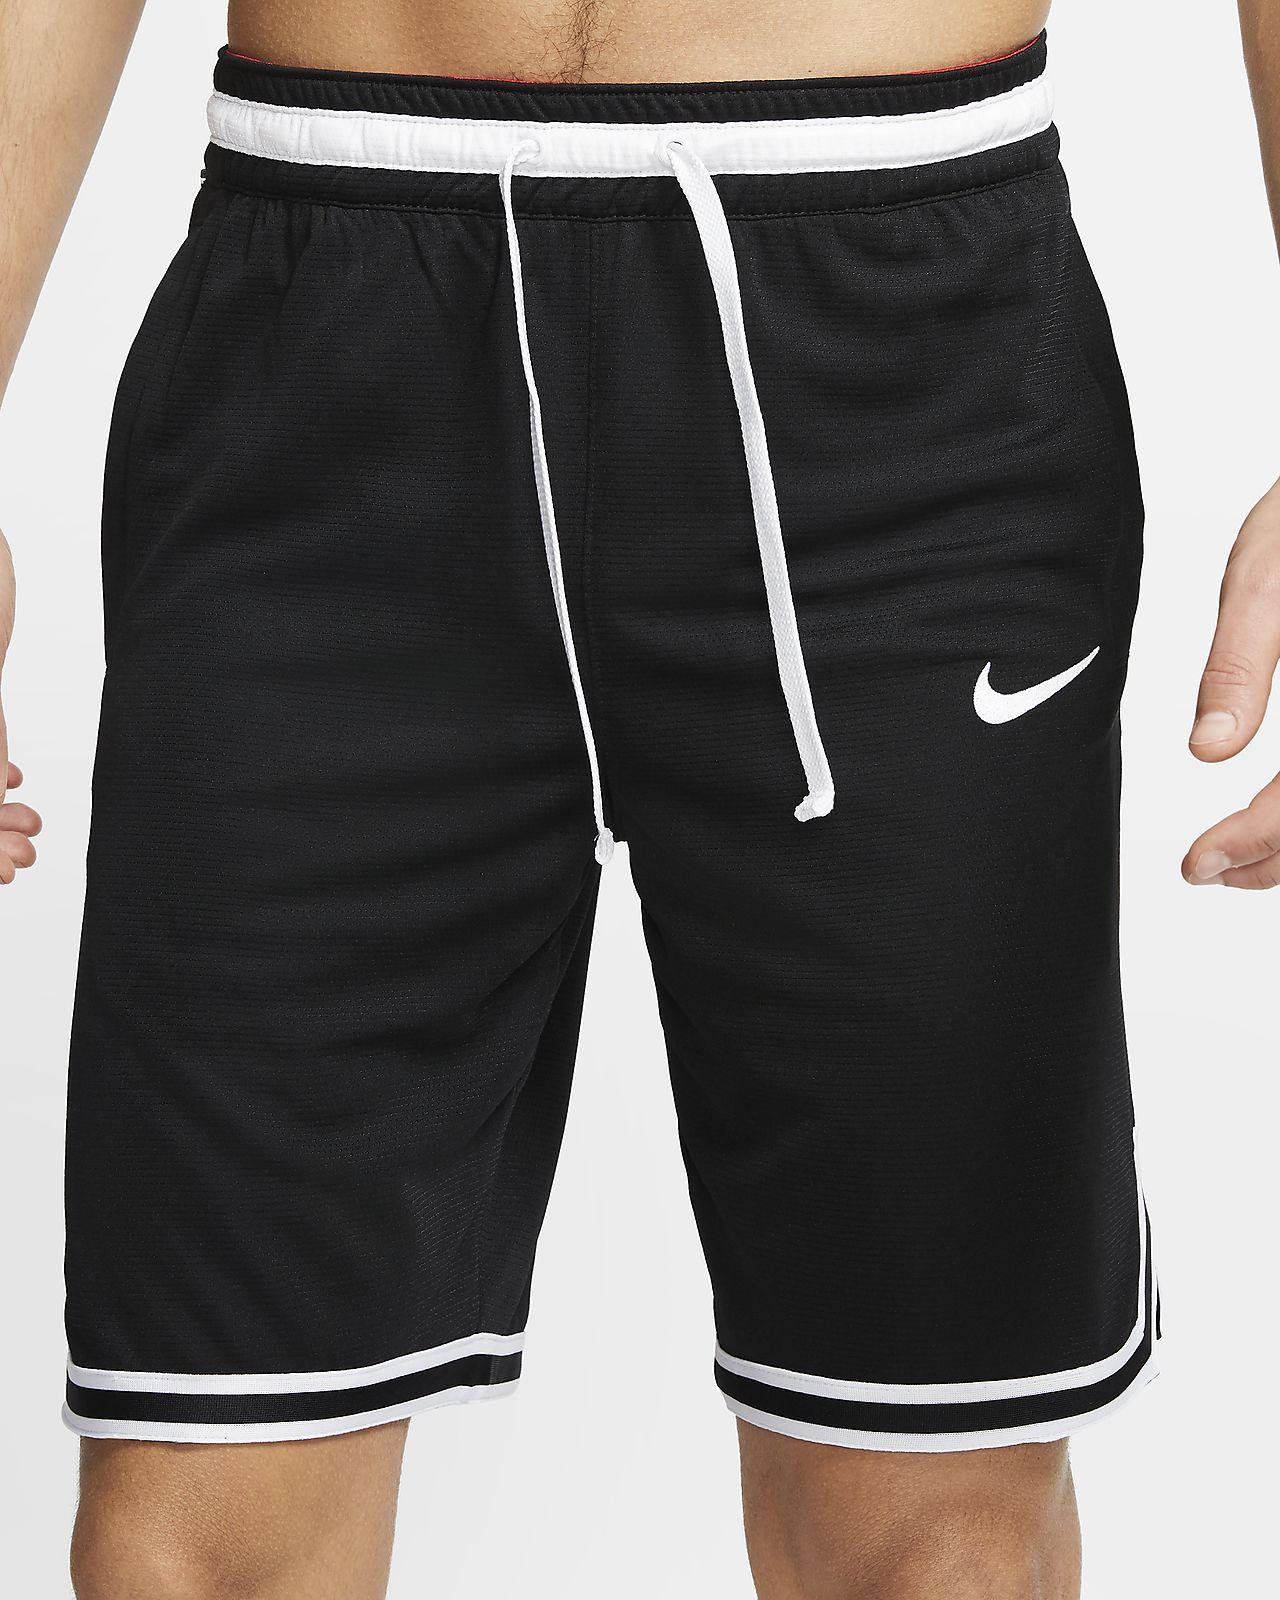 Hombre Nike Básquetbol Shorts Para Dna Fit Dri De vN0P8Oymnw